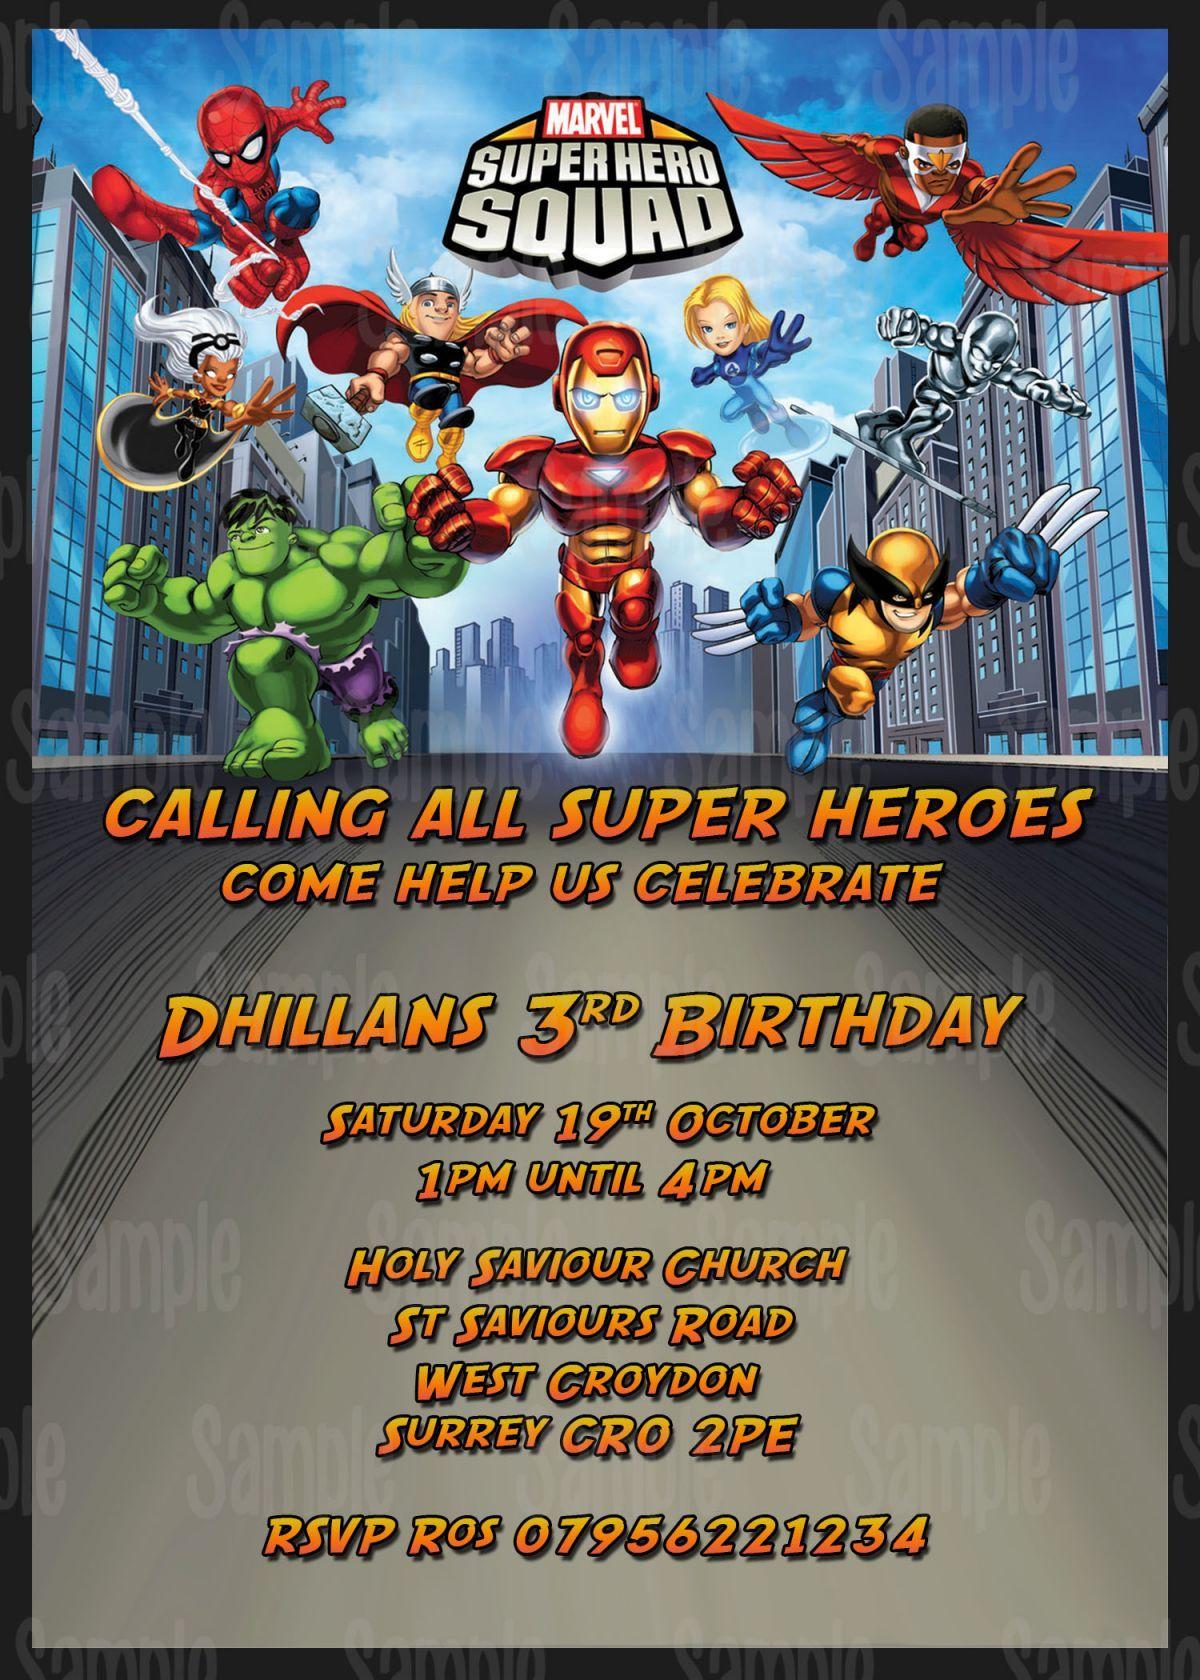 superhero birthday party invite ideas - Google Search | baby shower ...